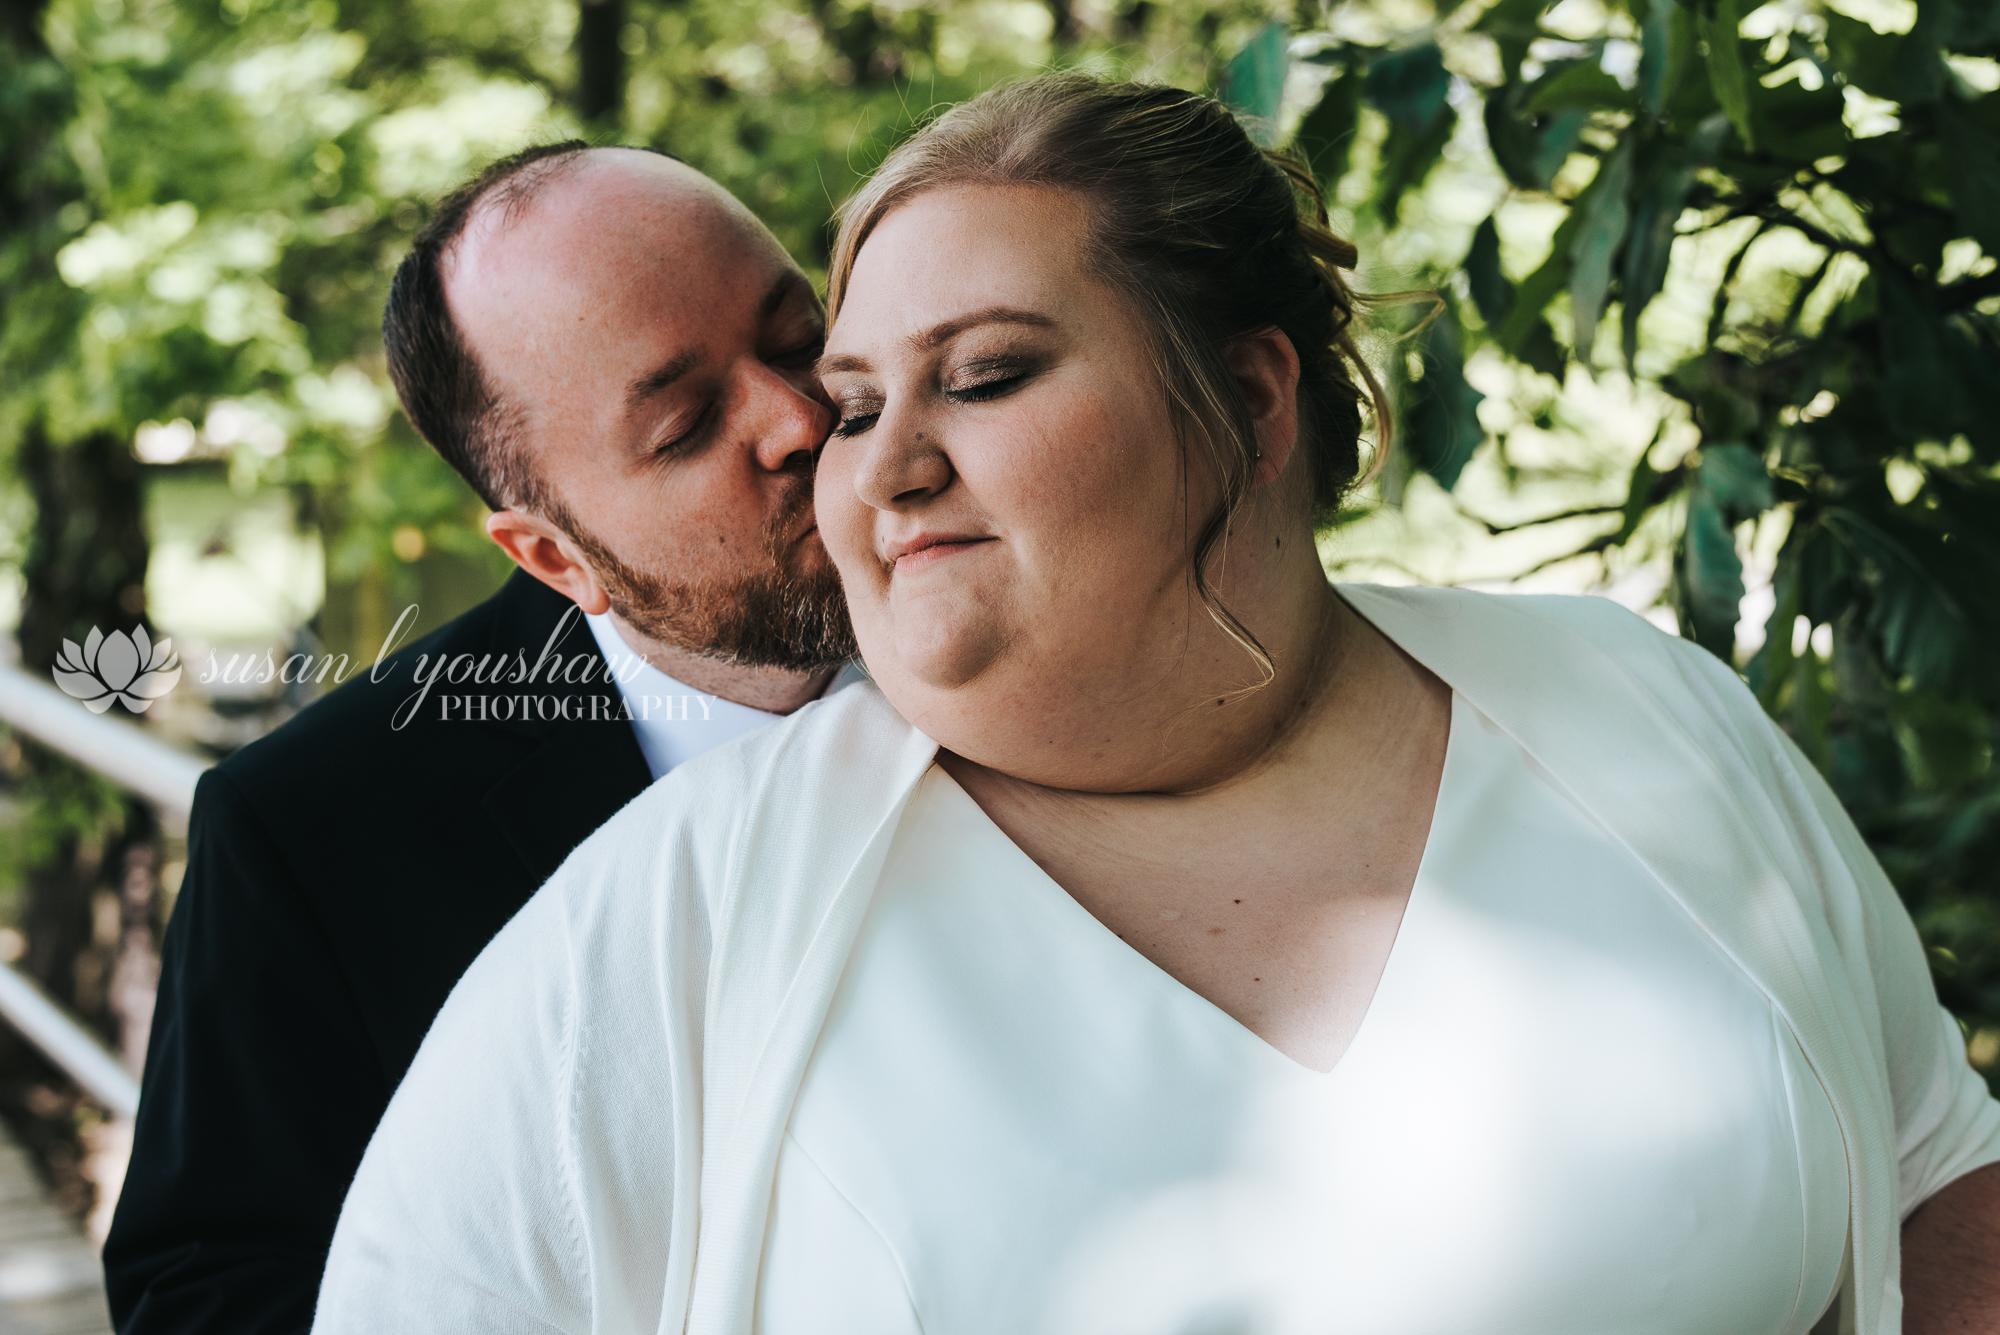 Bill and Sarah Wedding Photos 06-08-2019 SLY Photography -57.jpg